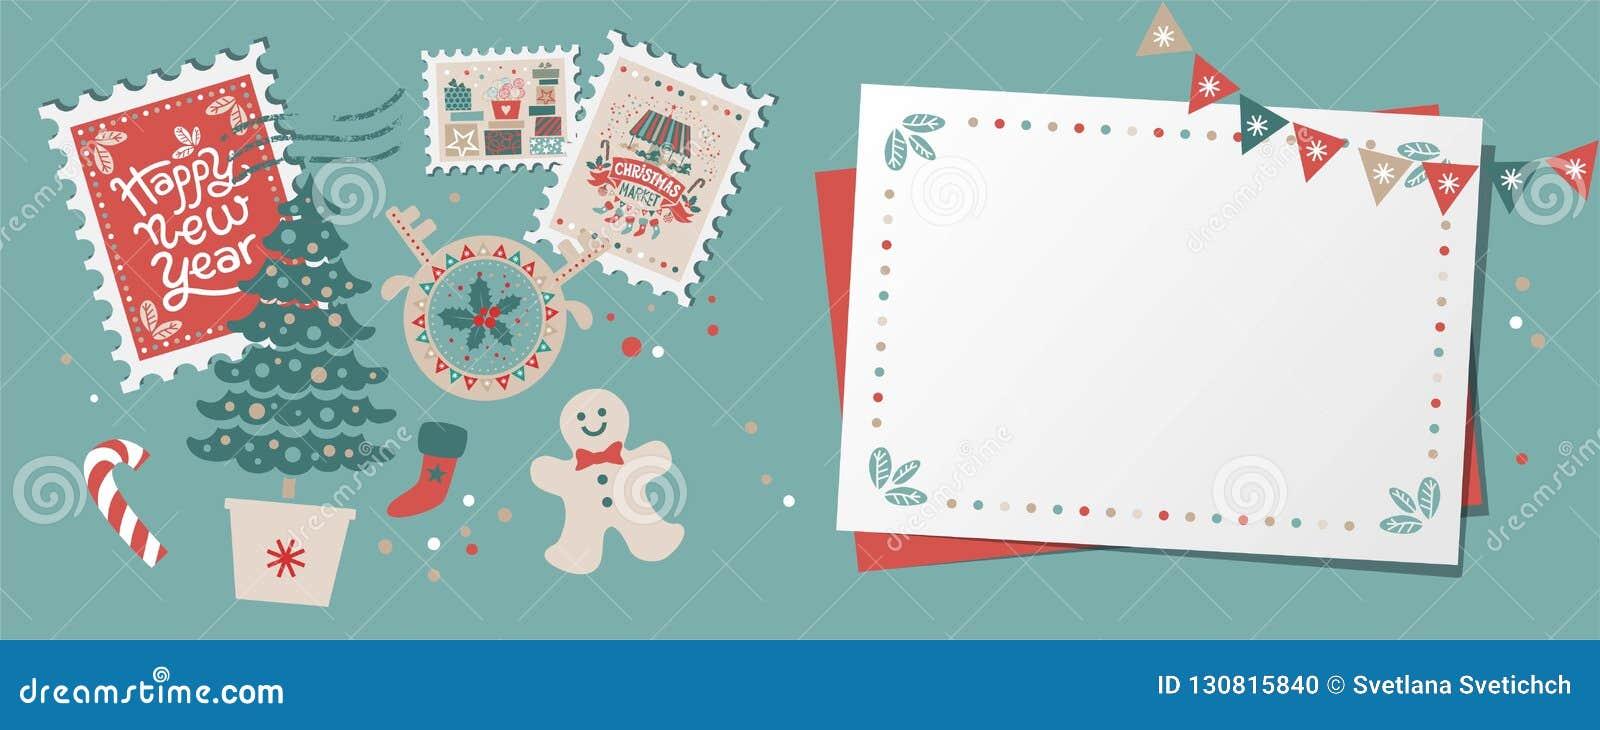 Festive Christmas border, frame, card